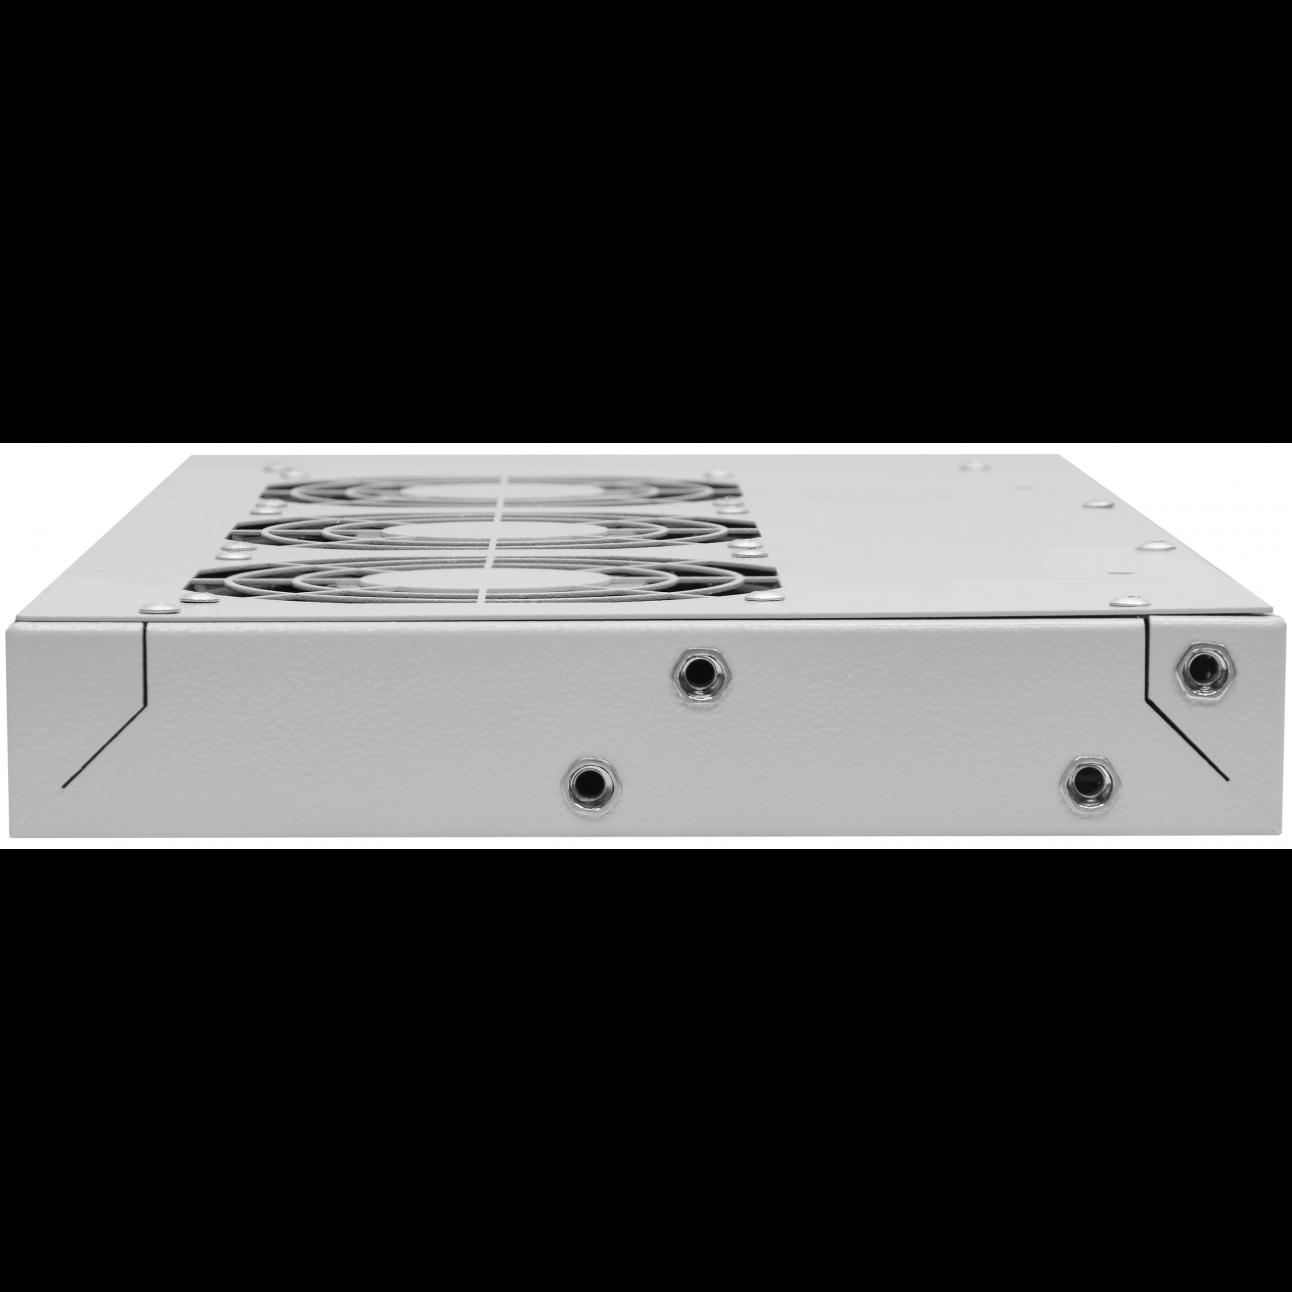 "Модуль вентиляторный 19"", 3 вентилятора, регулируемая глубина 230-415мм, без терморегулятора"